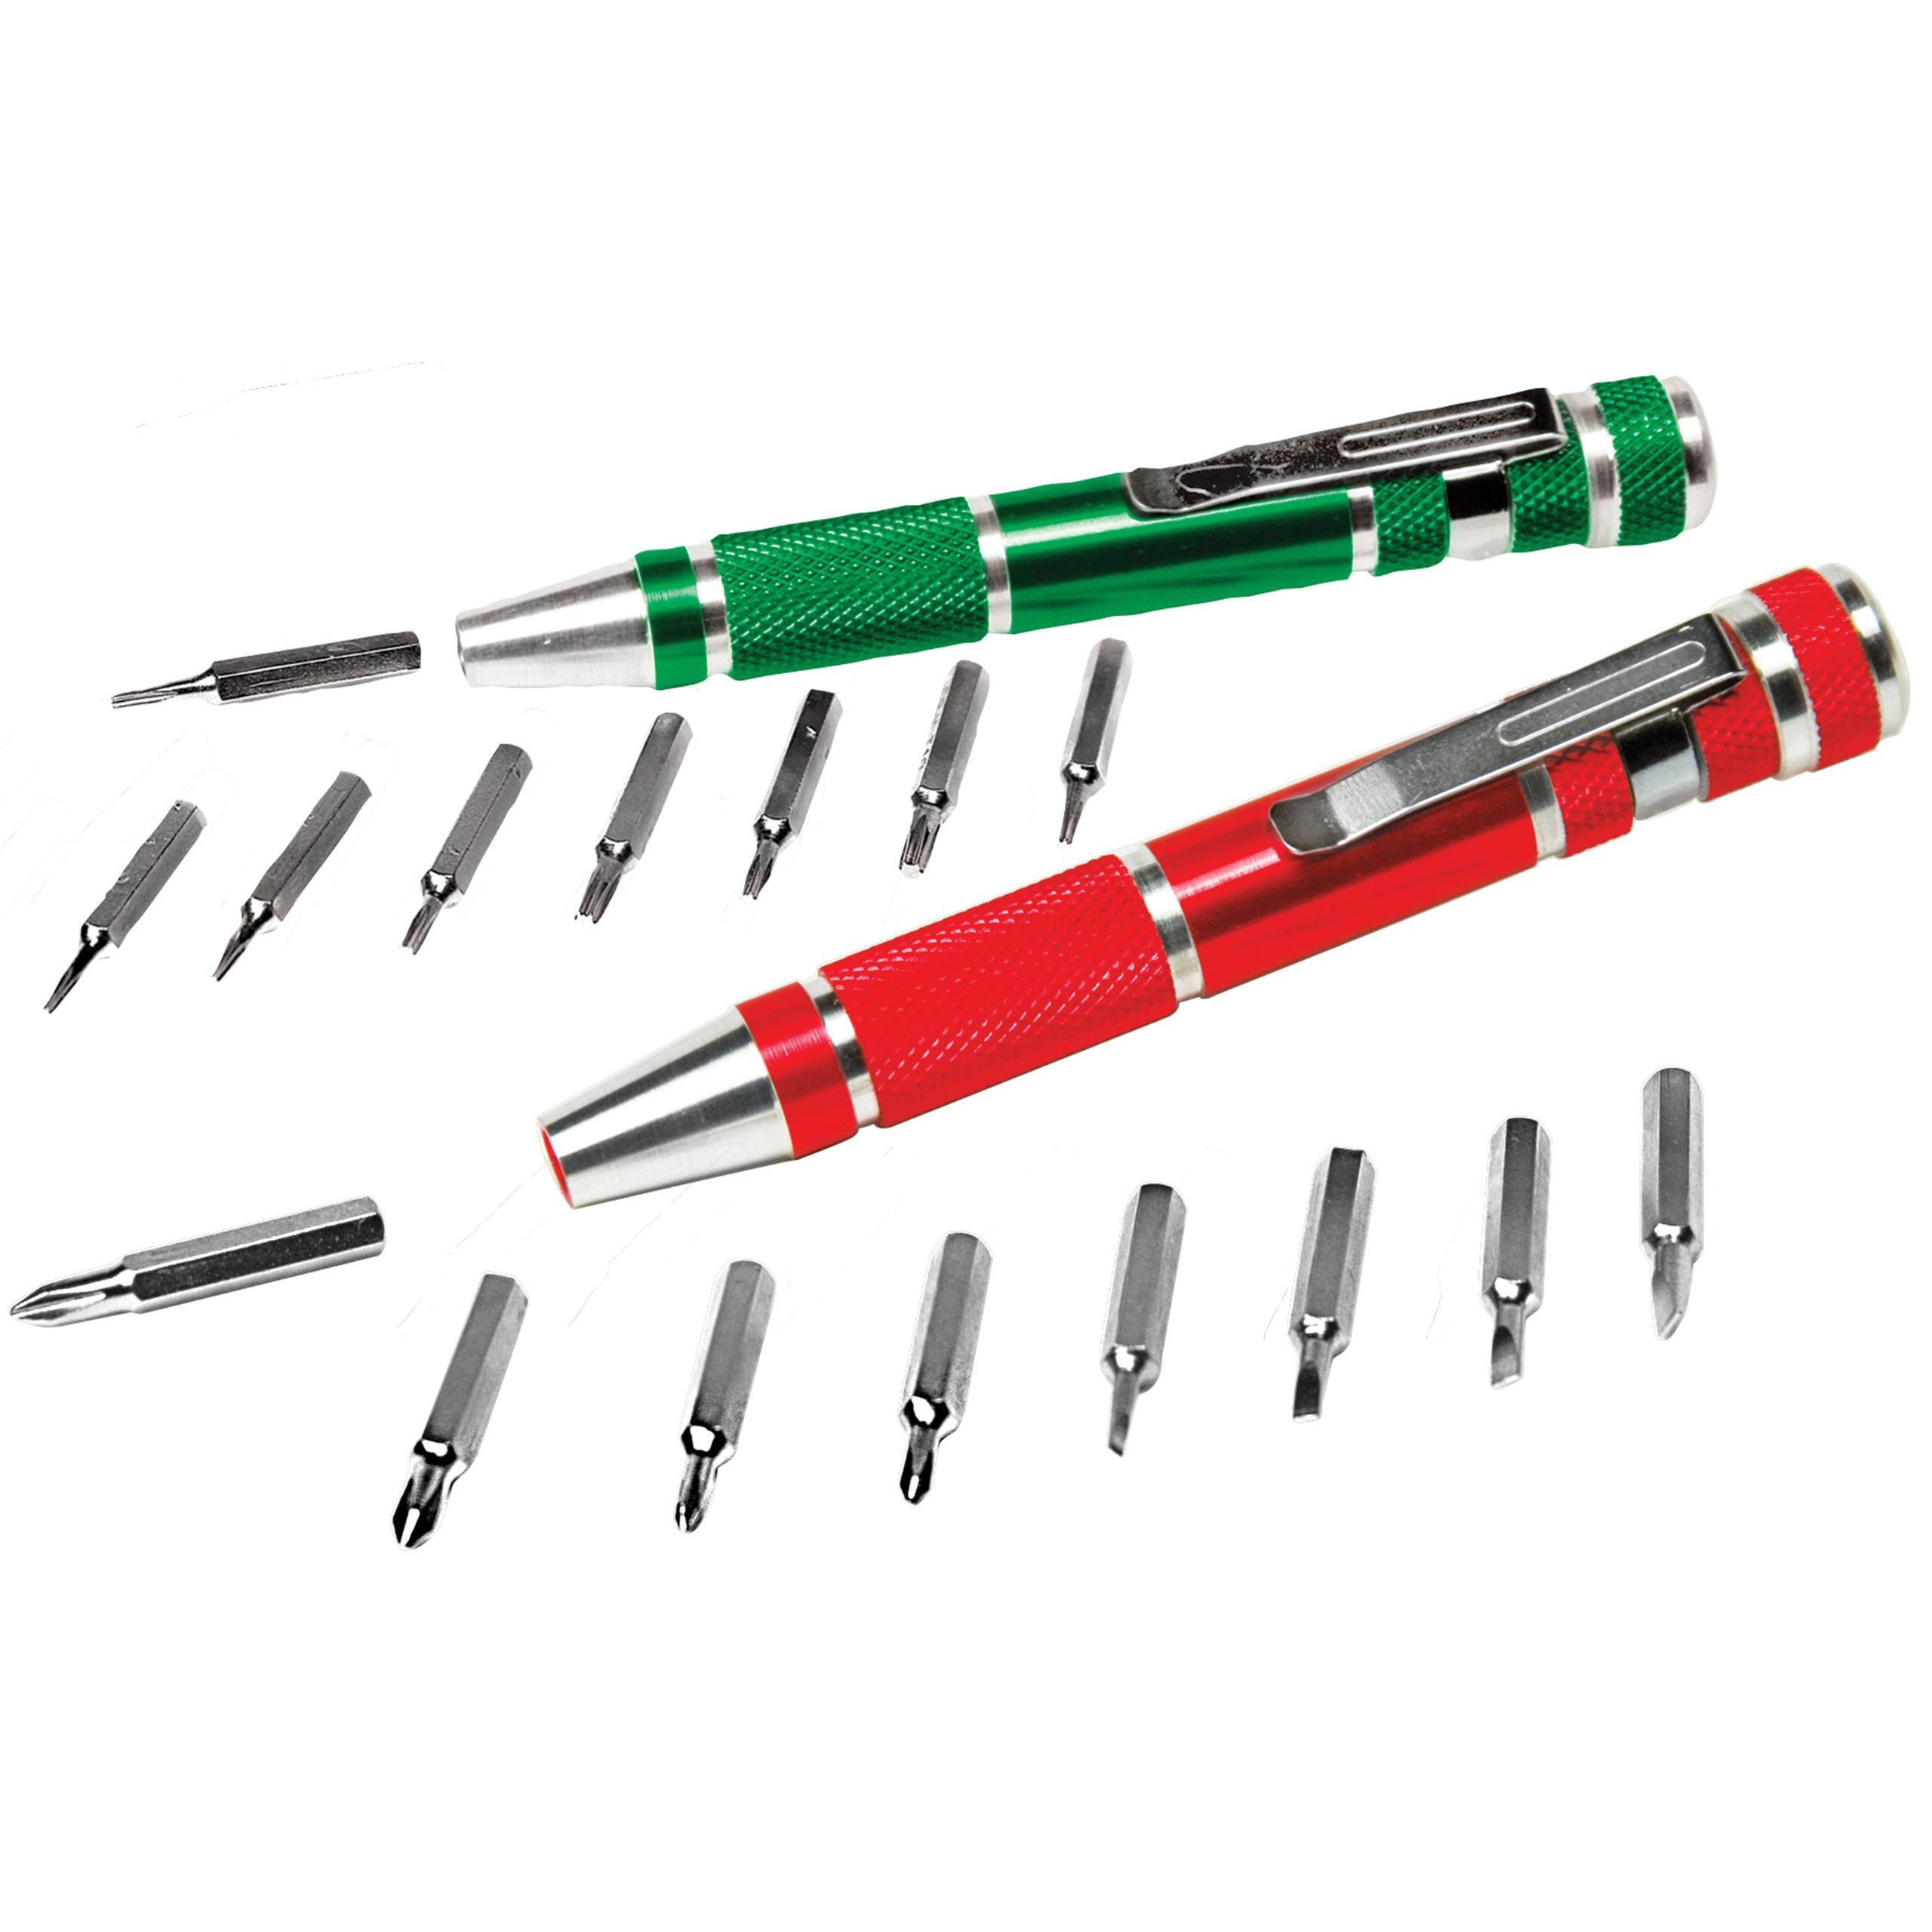 Performance Tool W9157 Precision Screwdrivers (2 Piece)